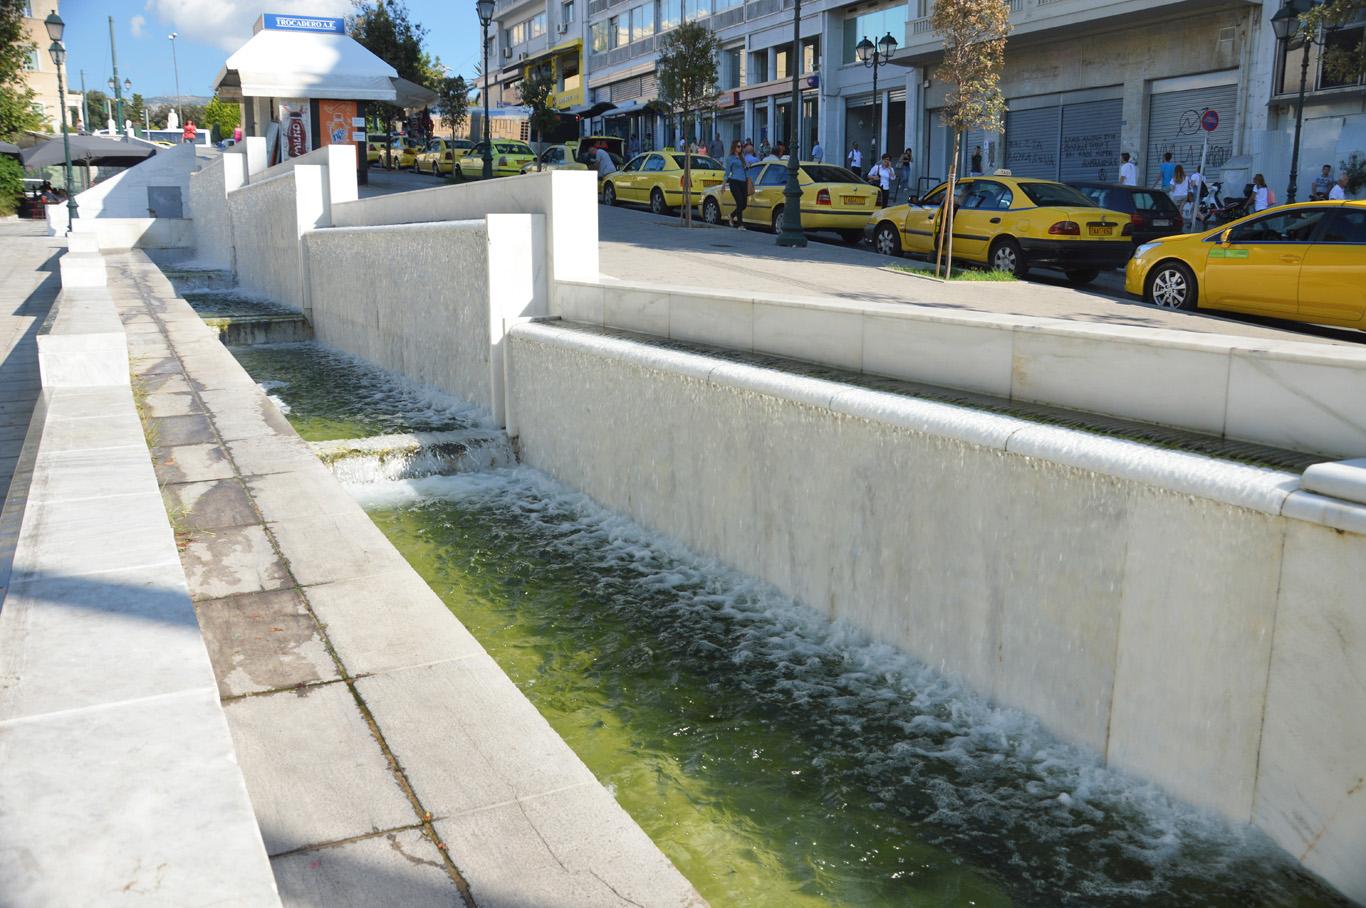 Fountains at Santygma Square